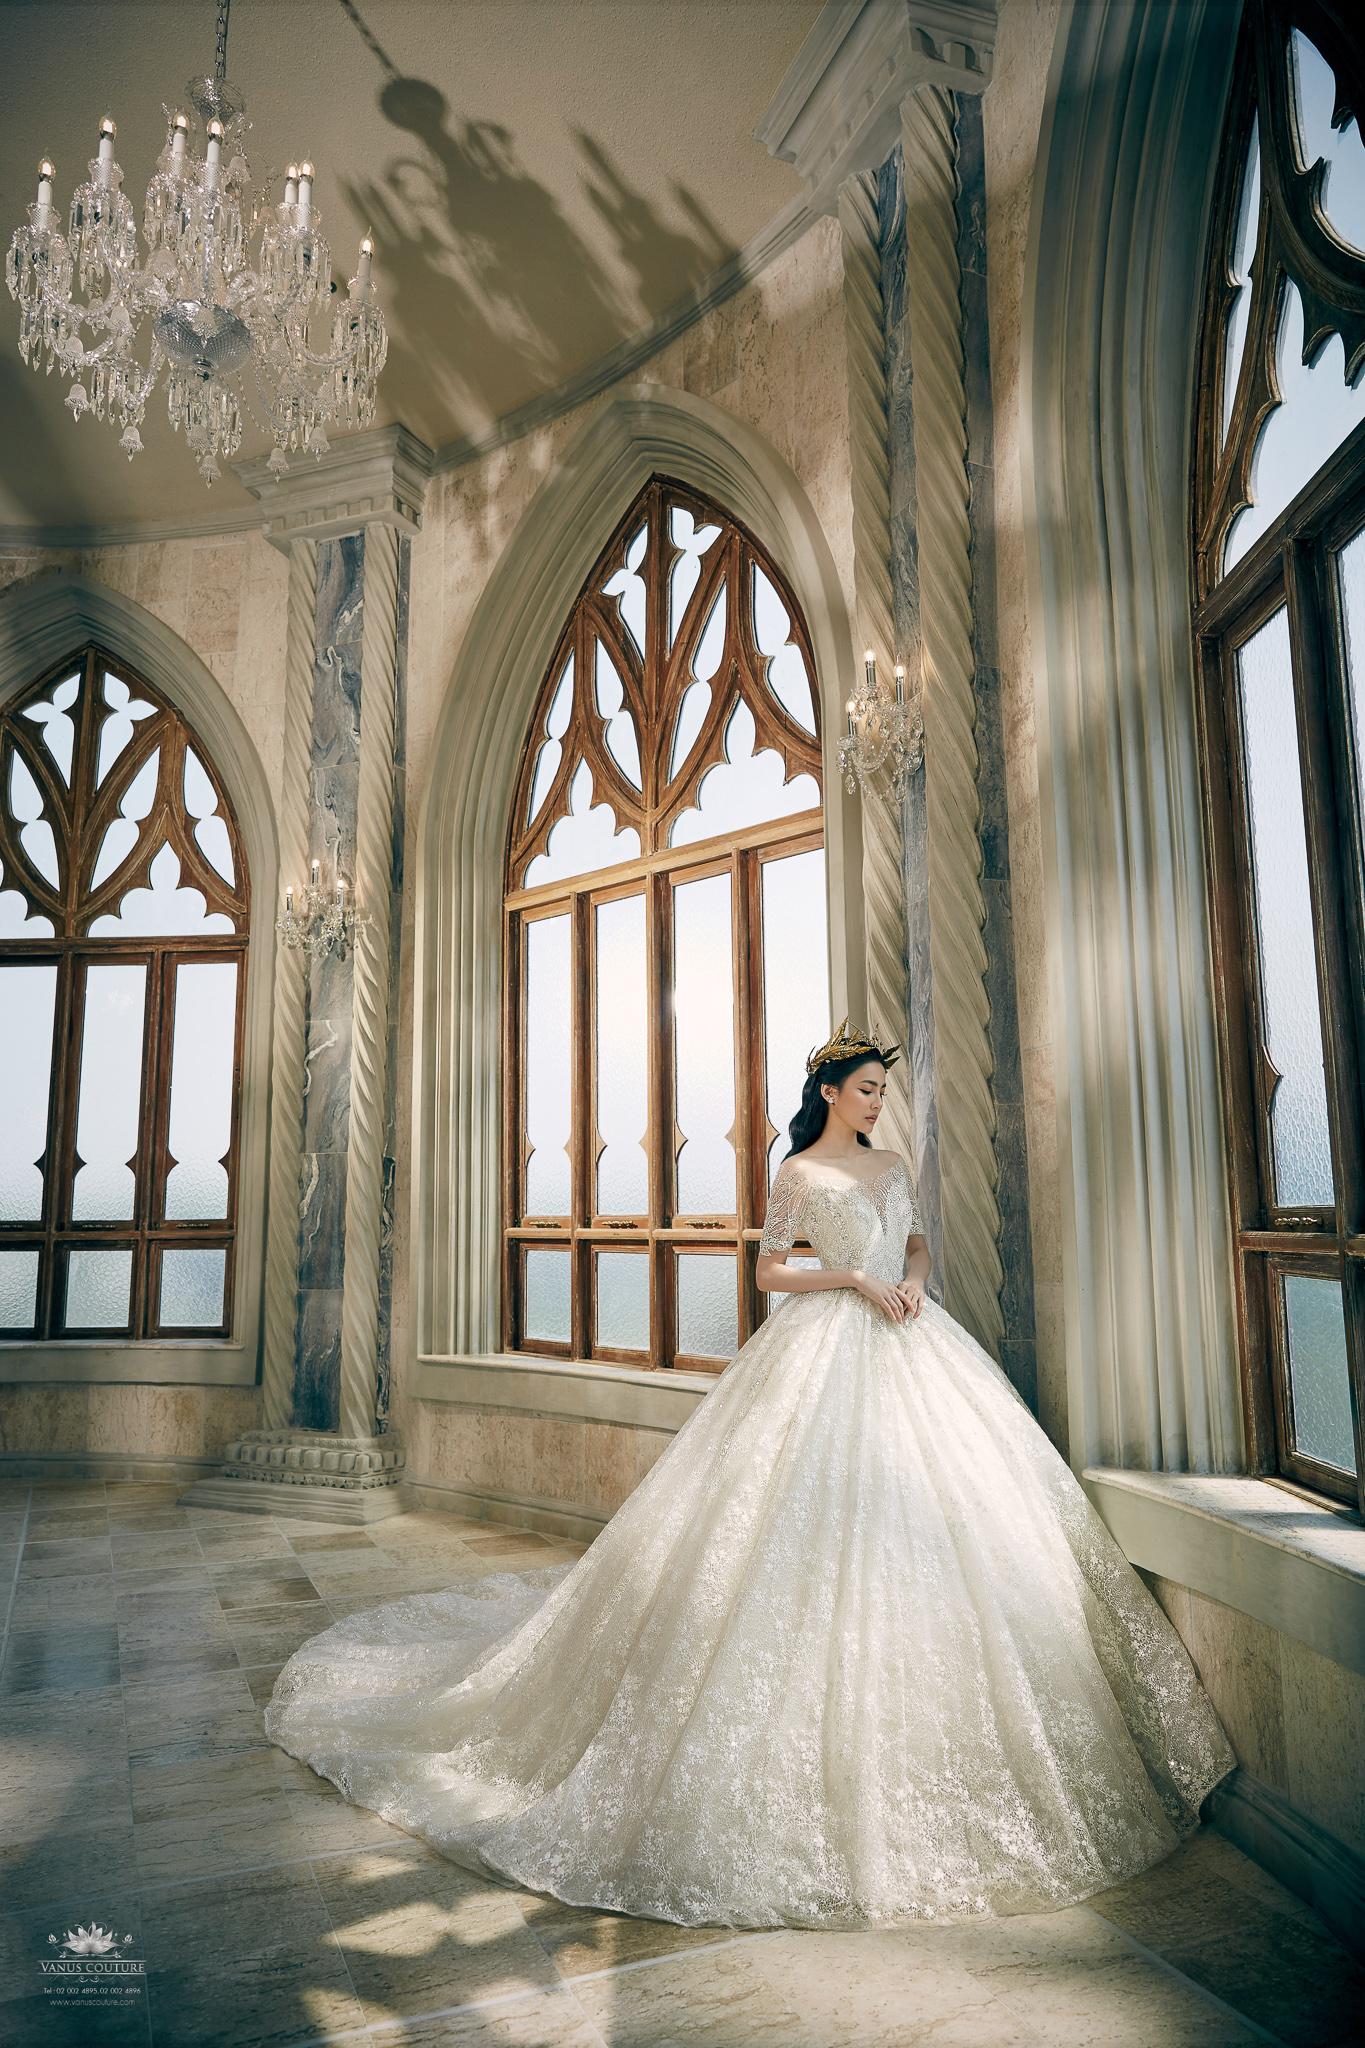 Superball wedding dress - Gybzy 02